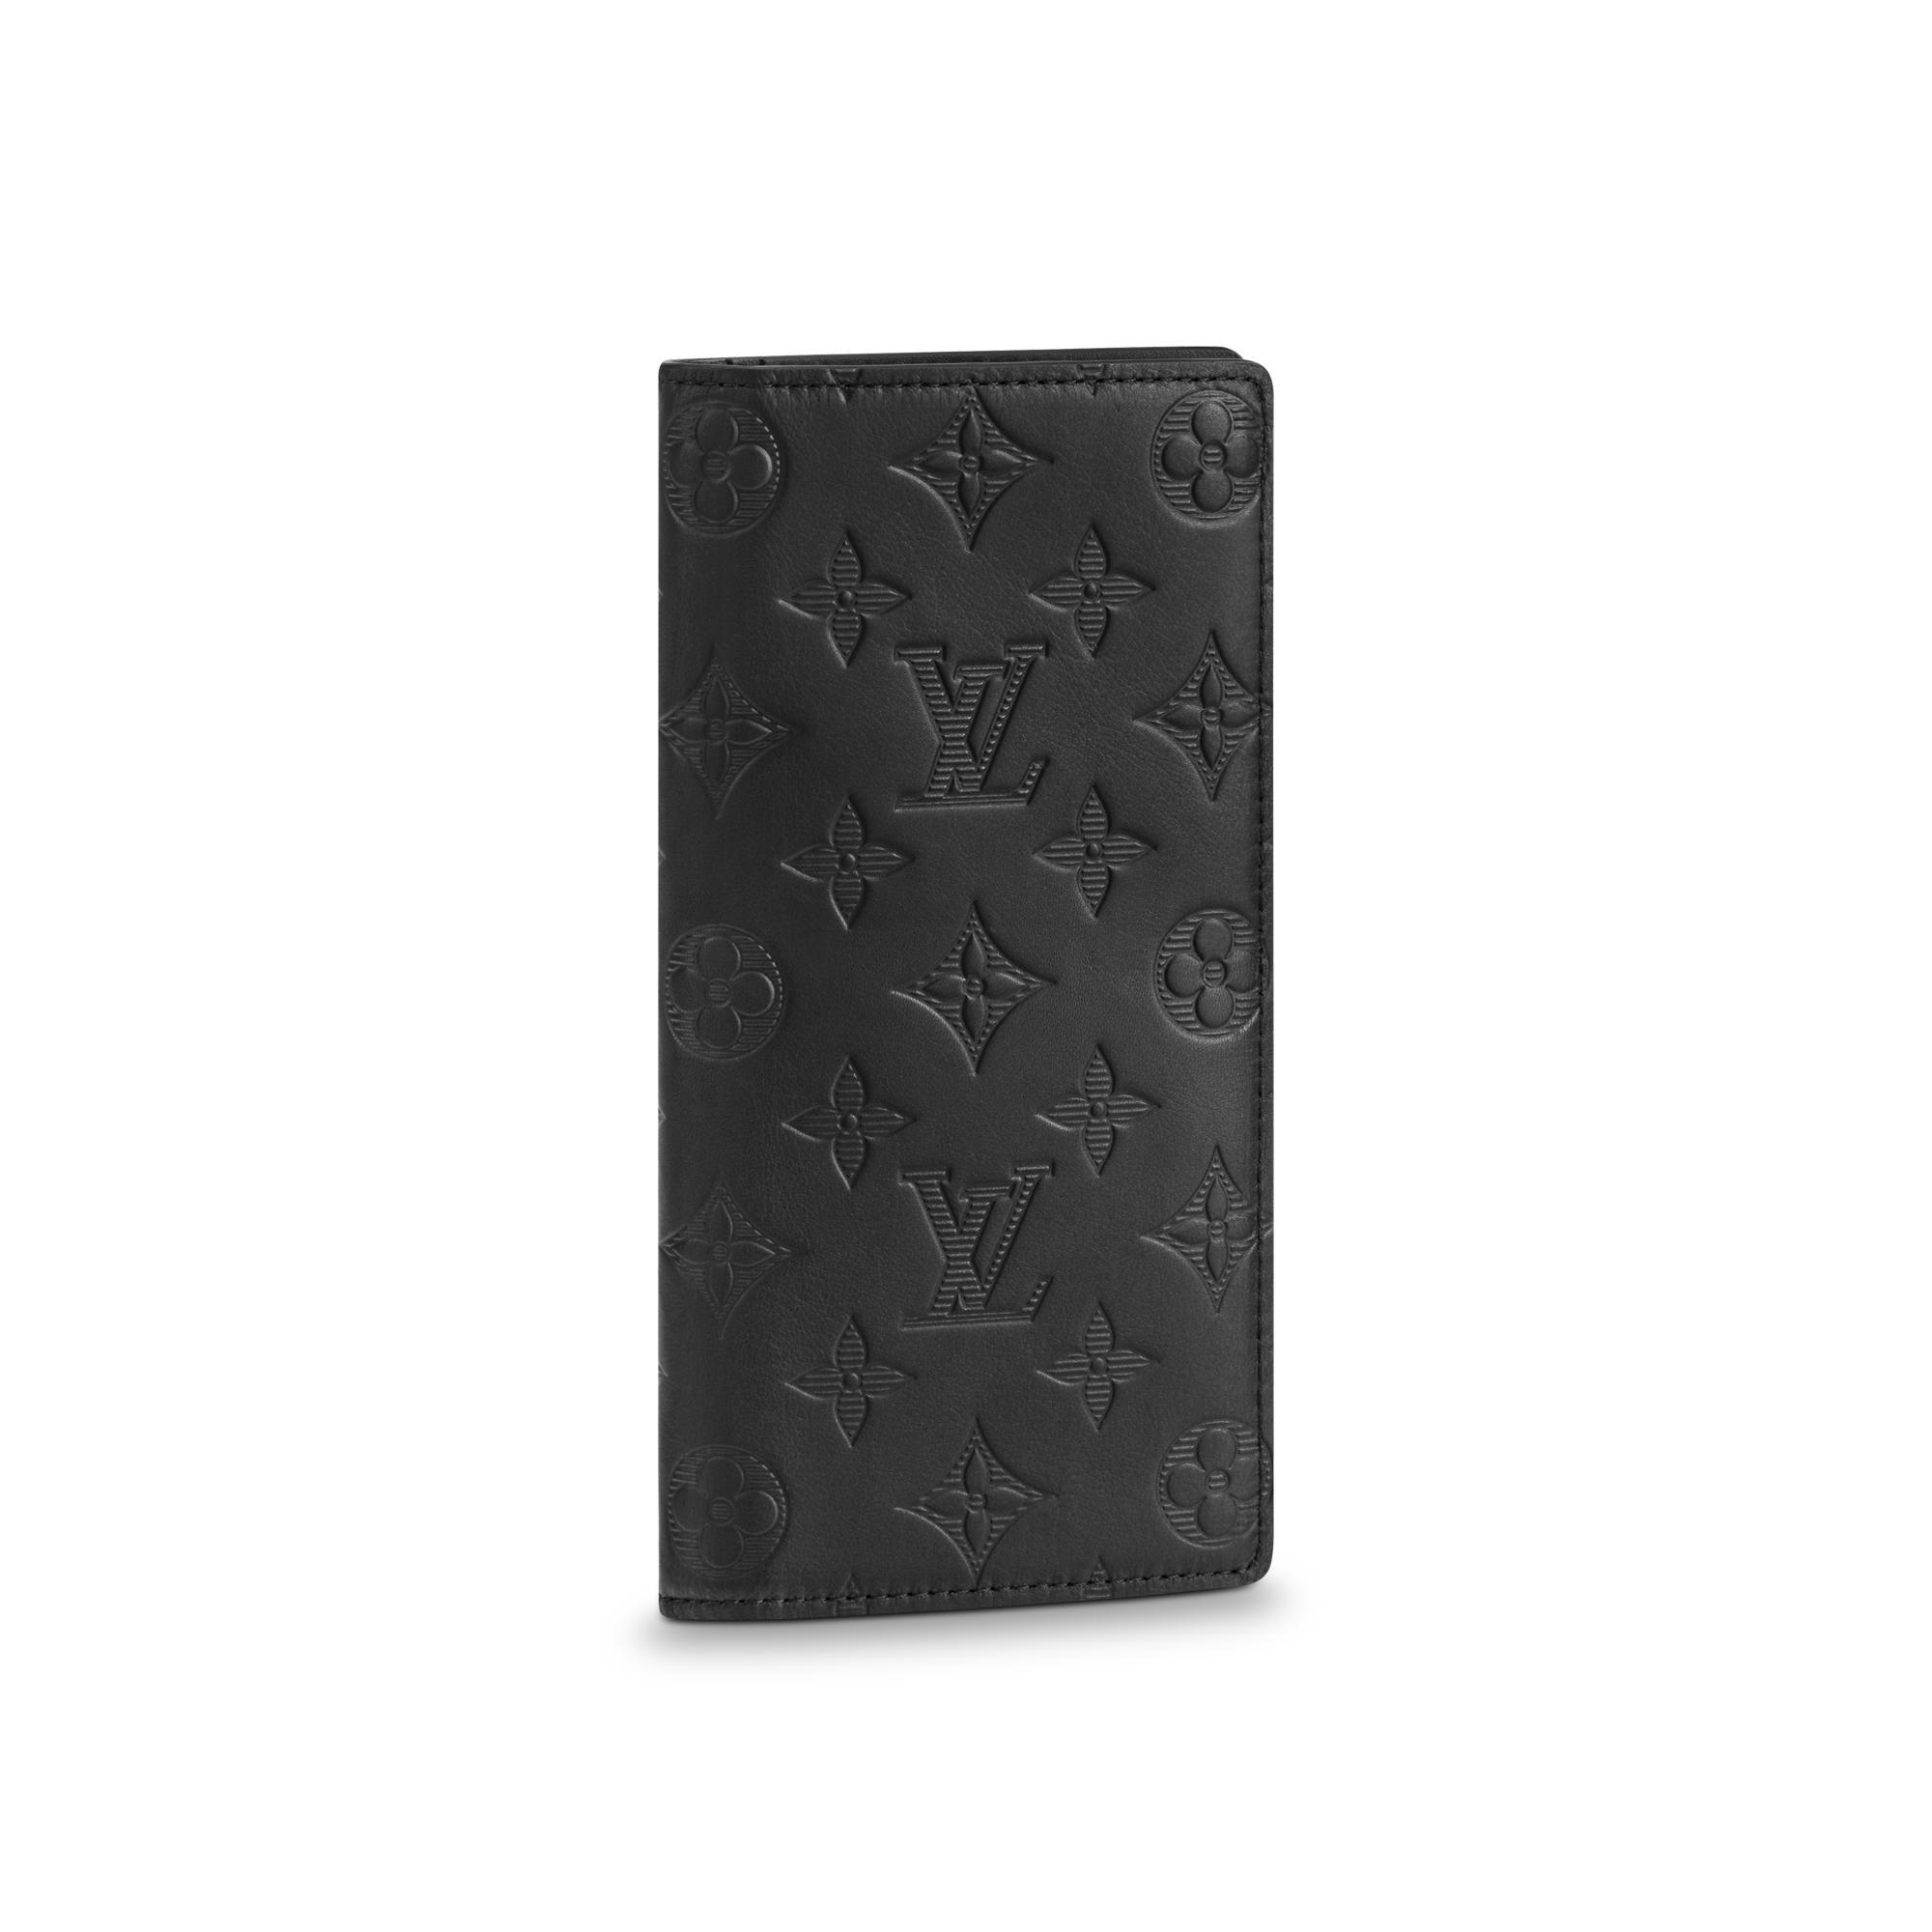 1952b52aa21d Louis Vuitton Brazza Wallet In Monogram Shadow